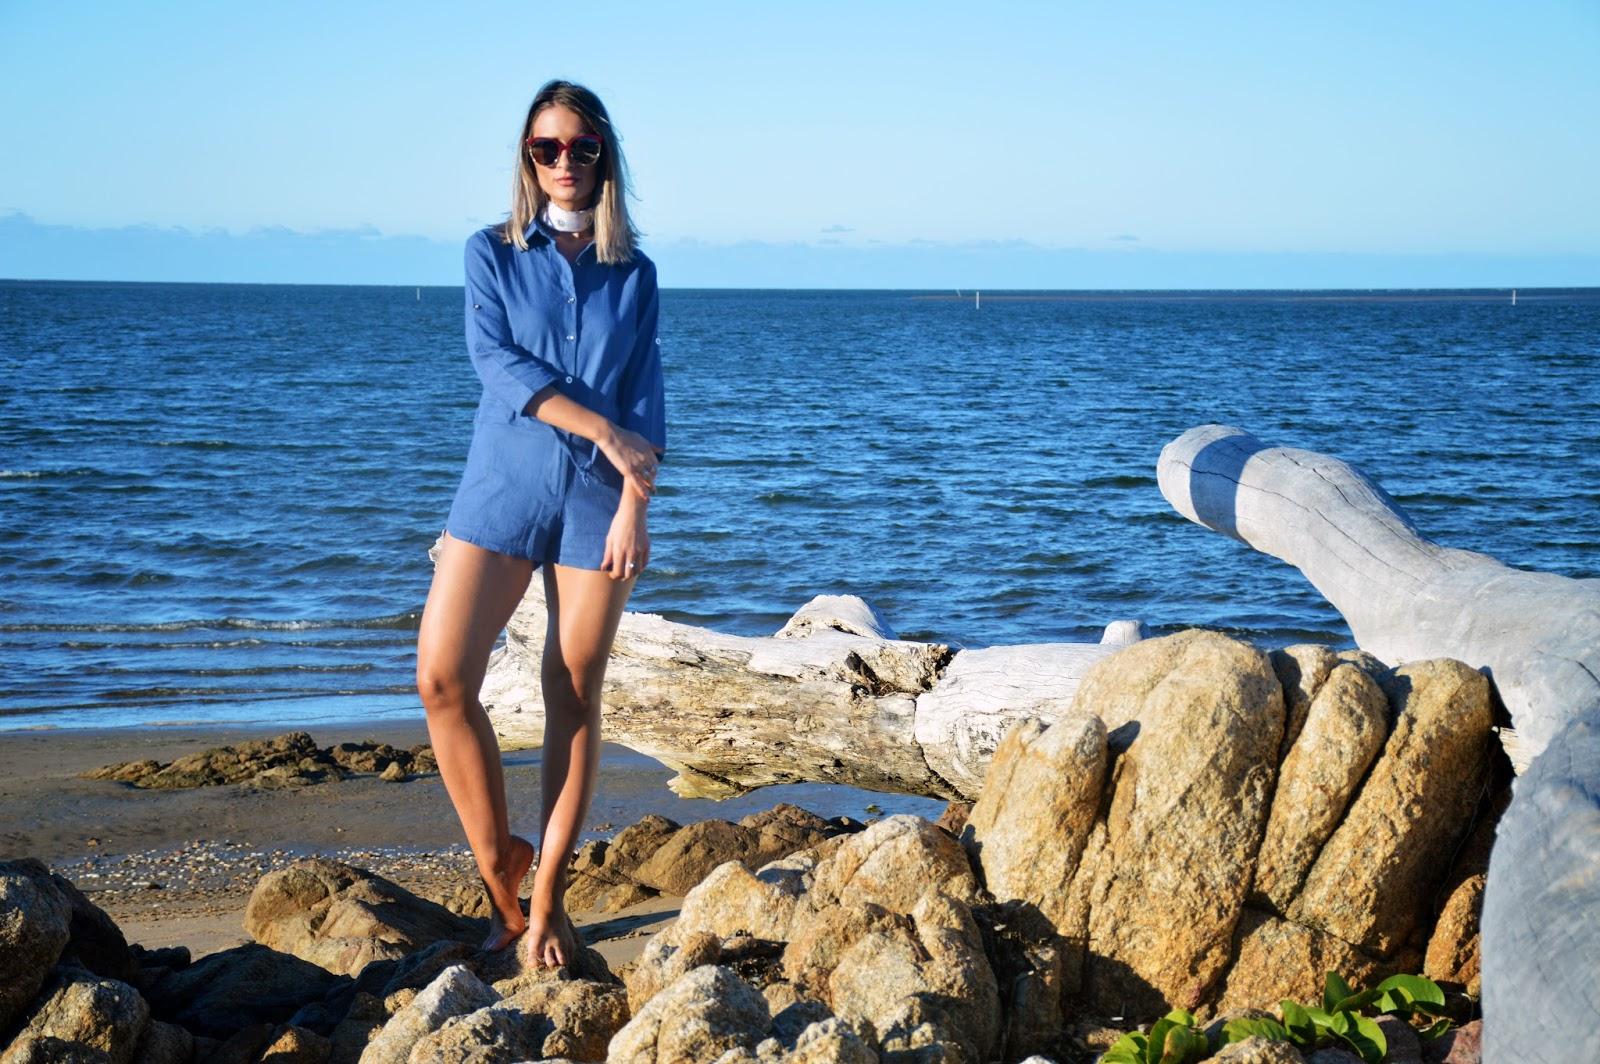 https://4.bp.blogspot.com/-Vz5WirWRvXs/V9eZvsaPcQI/AAAAAAAAKIc/jZmTz4KtuKkJGwmofyonx-niXlgGMjyeQCLcB/s1600/denim-jumpsuit-beach-summer-style.jpg